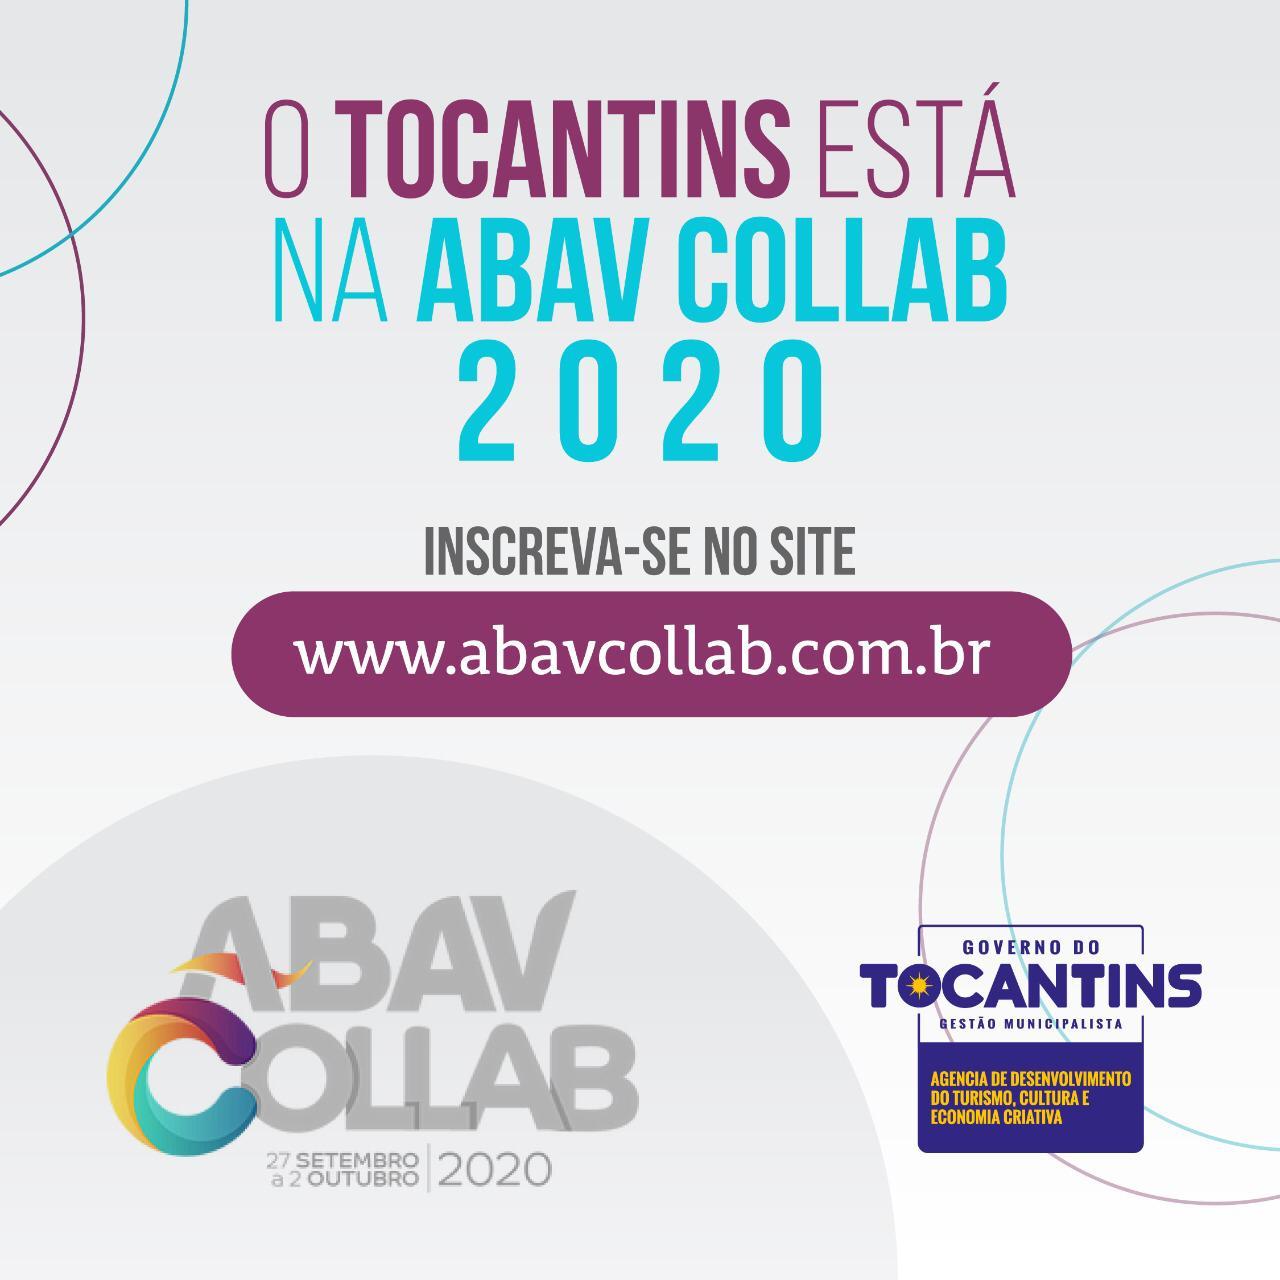 Tocantins participa da Abav Collab 2020